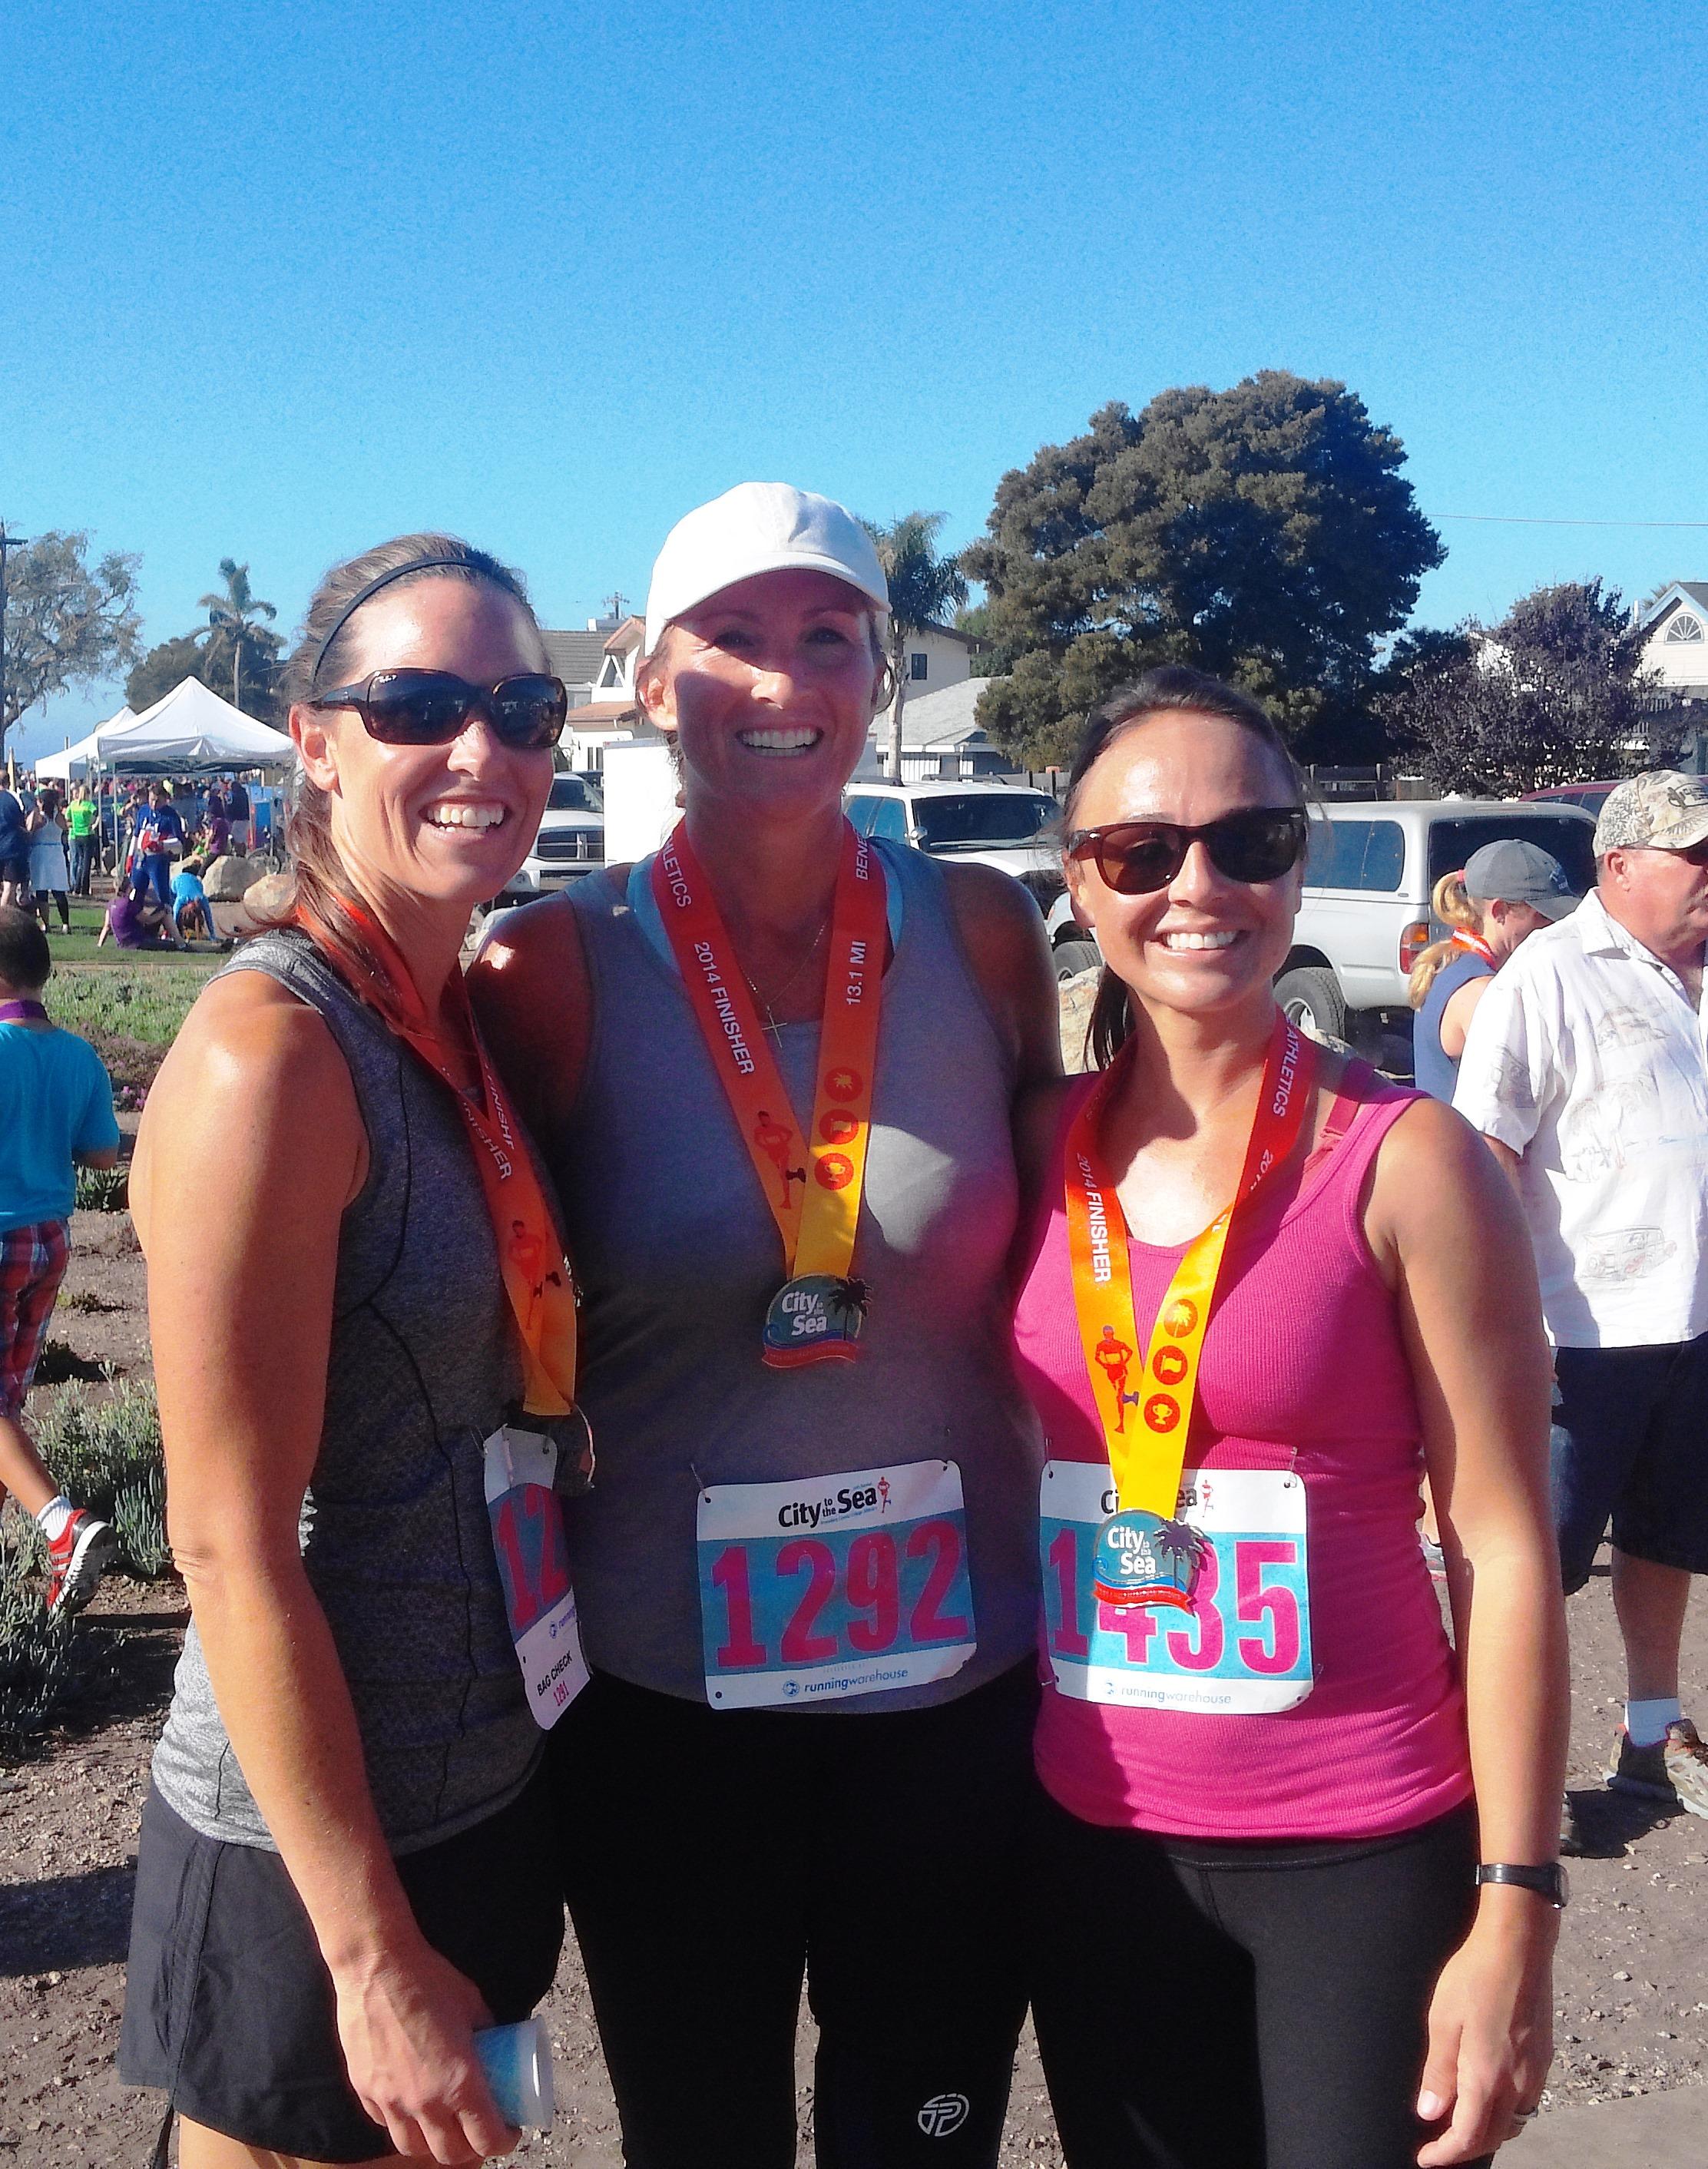 Hannah shipman (middle) finishing the City to Sea 1/2 Marathon!